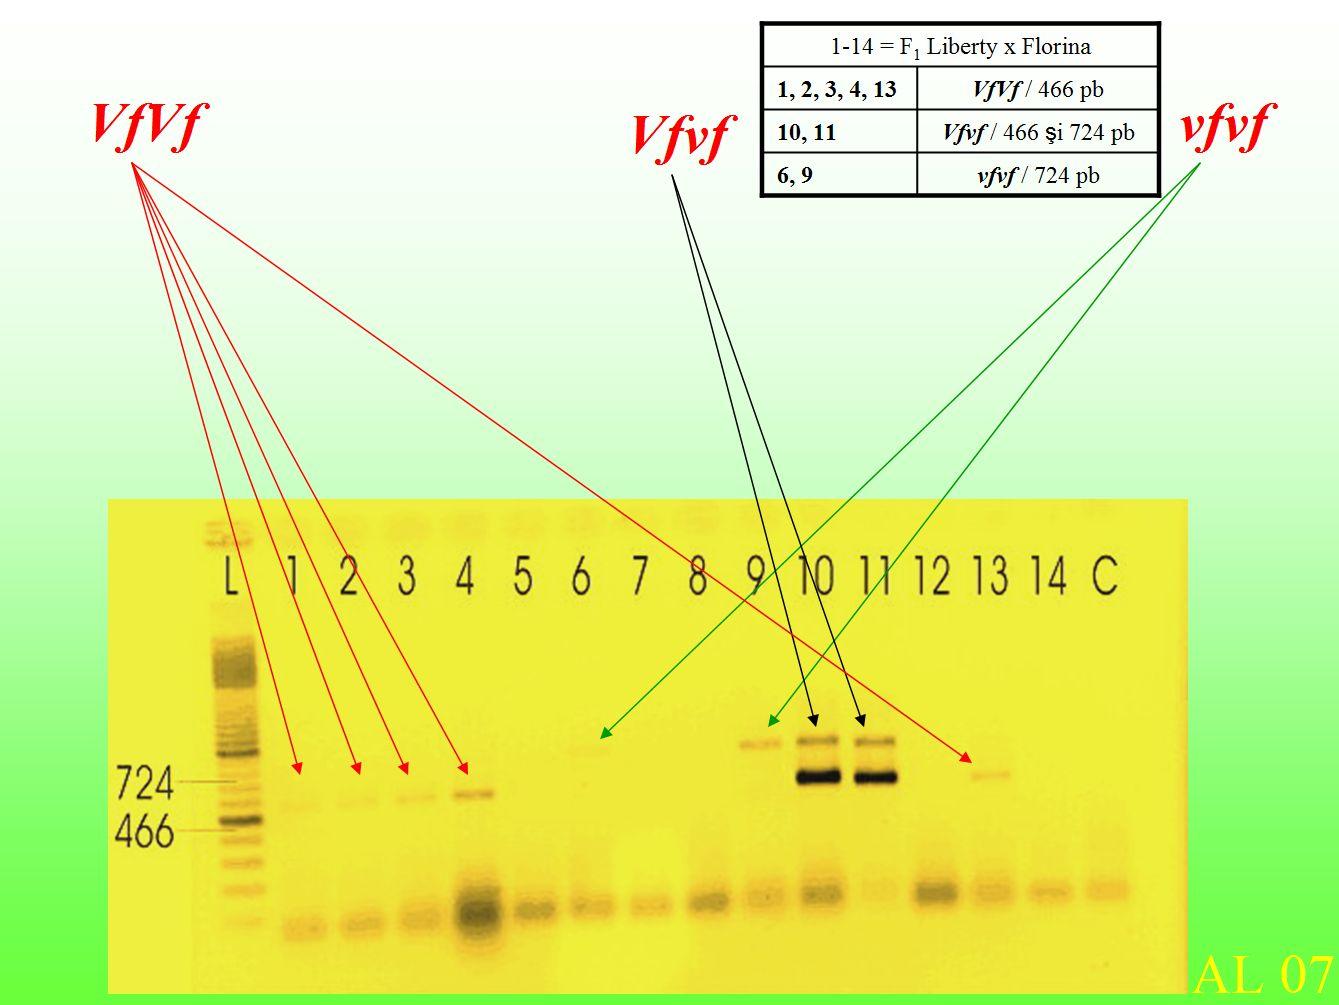 MAS selection - BSA apple breeding Cluj, Vf gene